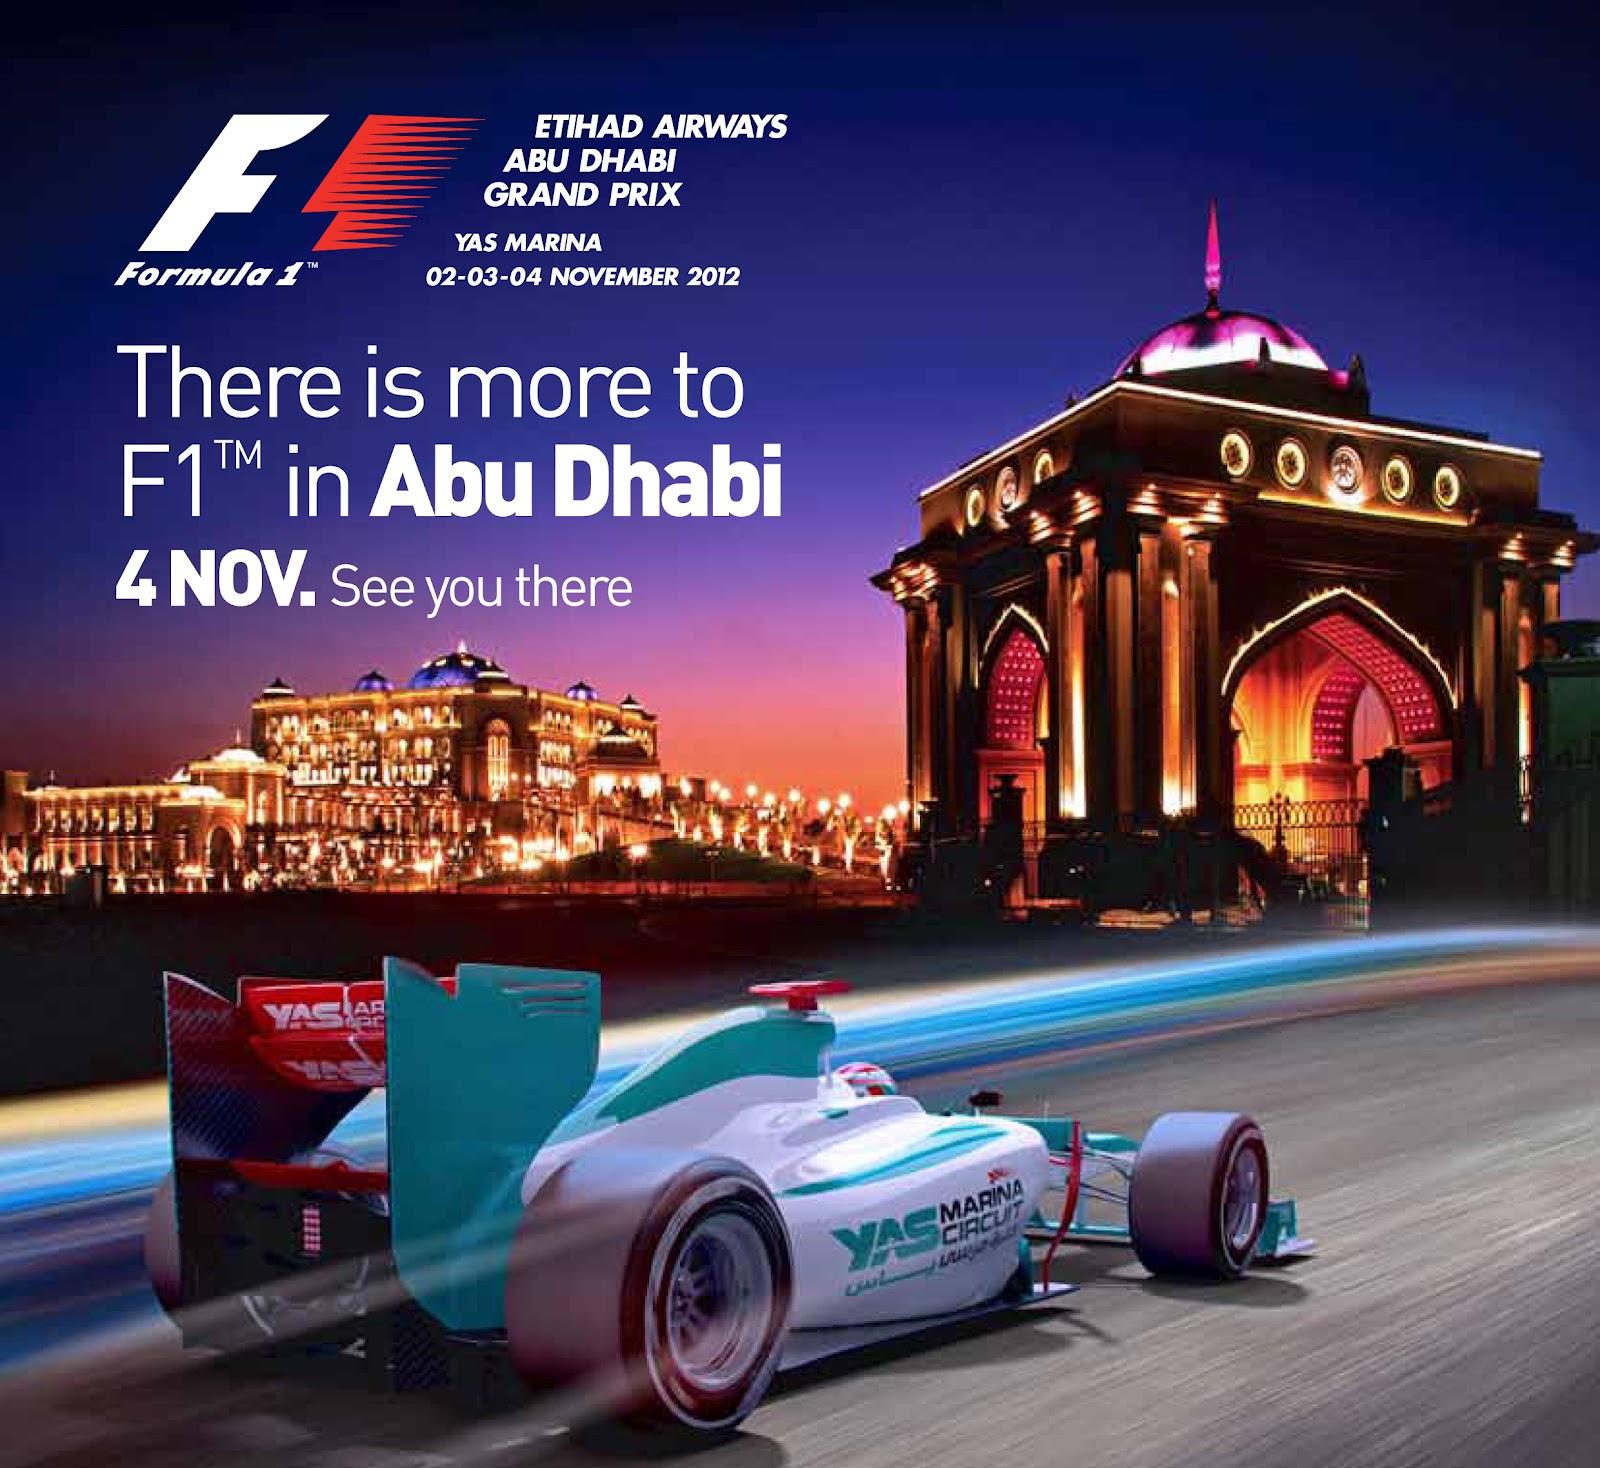 http://4.bp.blogspot.com/-3u-BhhFMX7Q/T5pmugBfVBI/AAAAAAAABUc/e7wz6-_rAbE/s1600/Abu+Dhabi+Grand+Prix.jpg